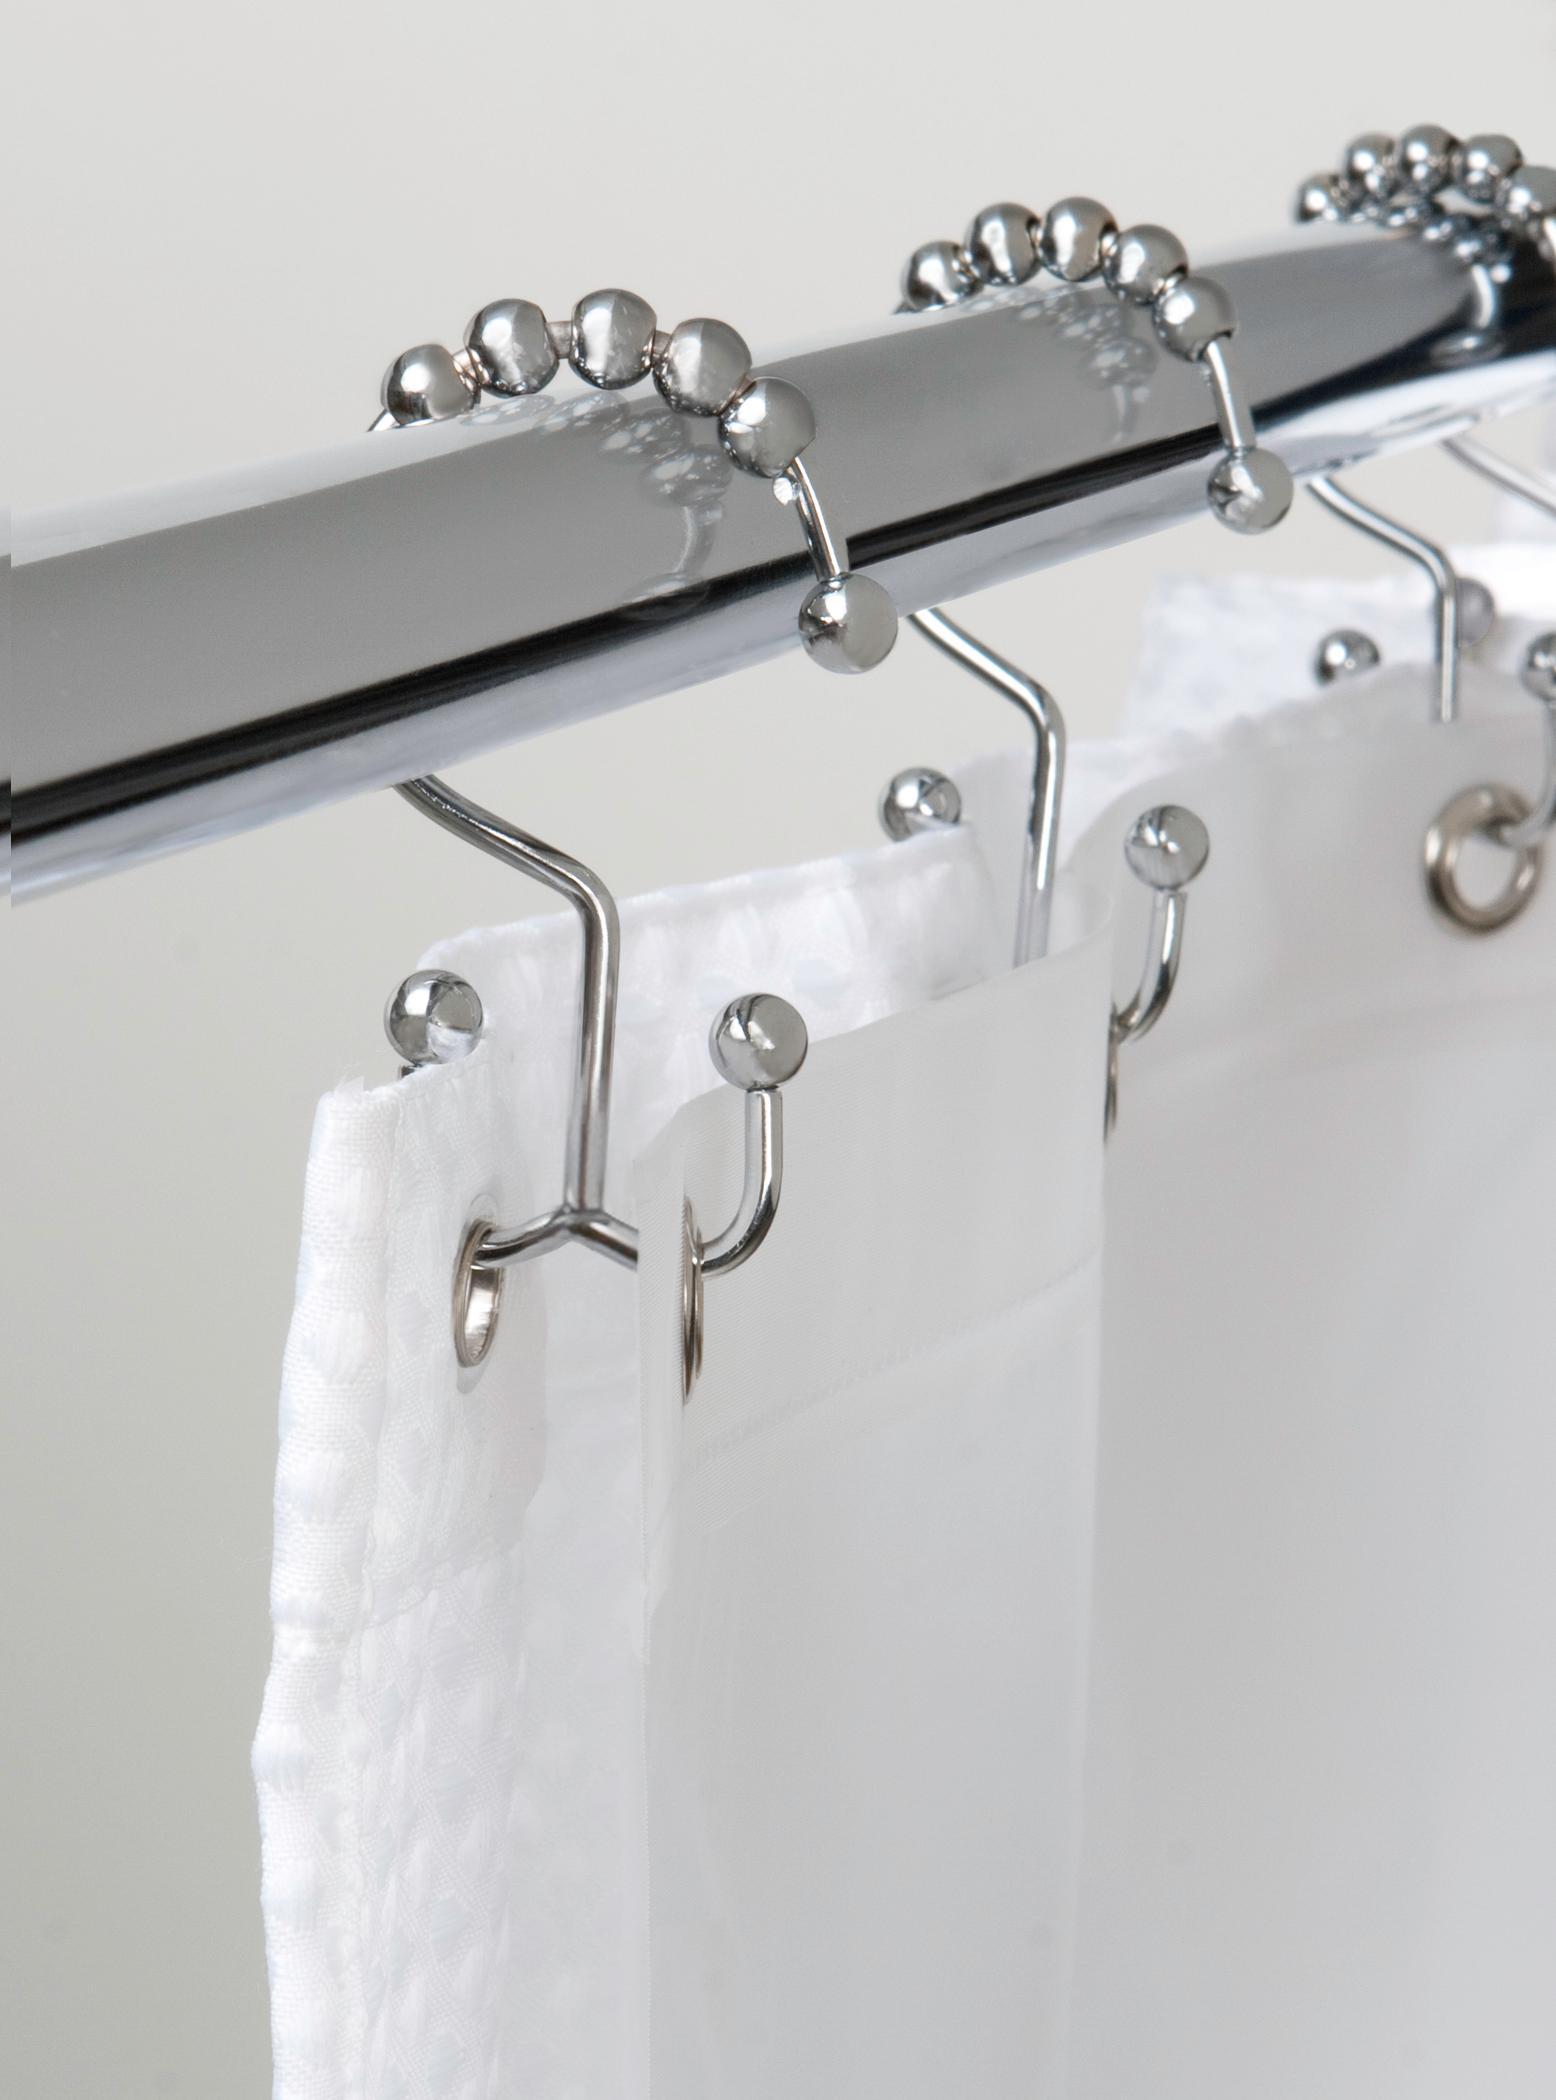 Bathroom Shower Hooks Shower Curtain Rings Rust Resistant